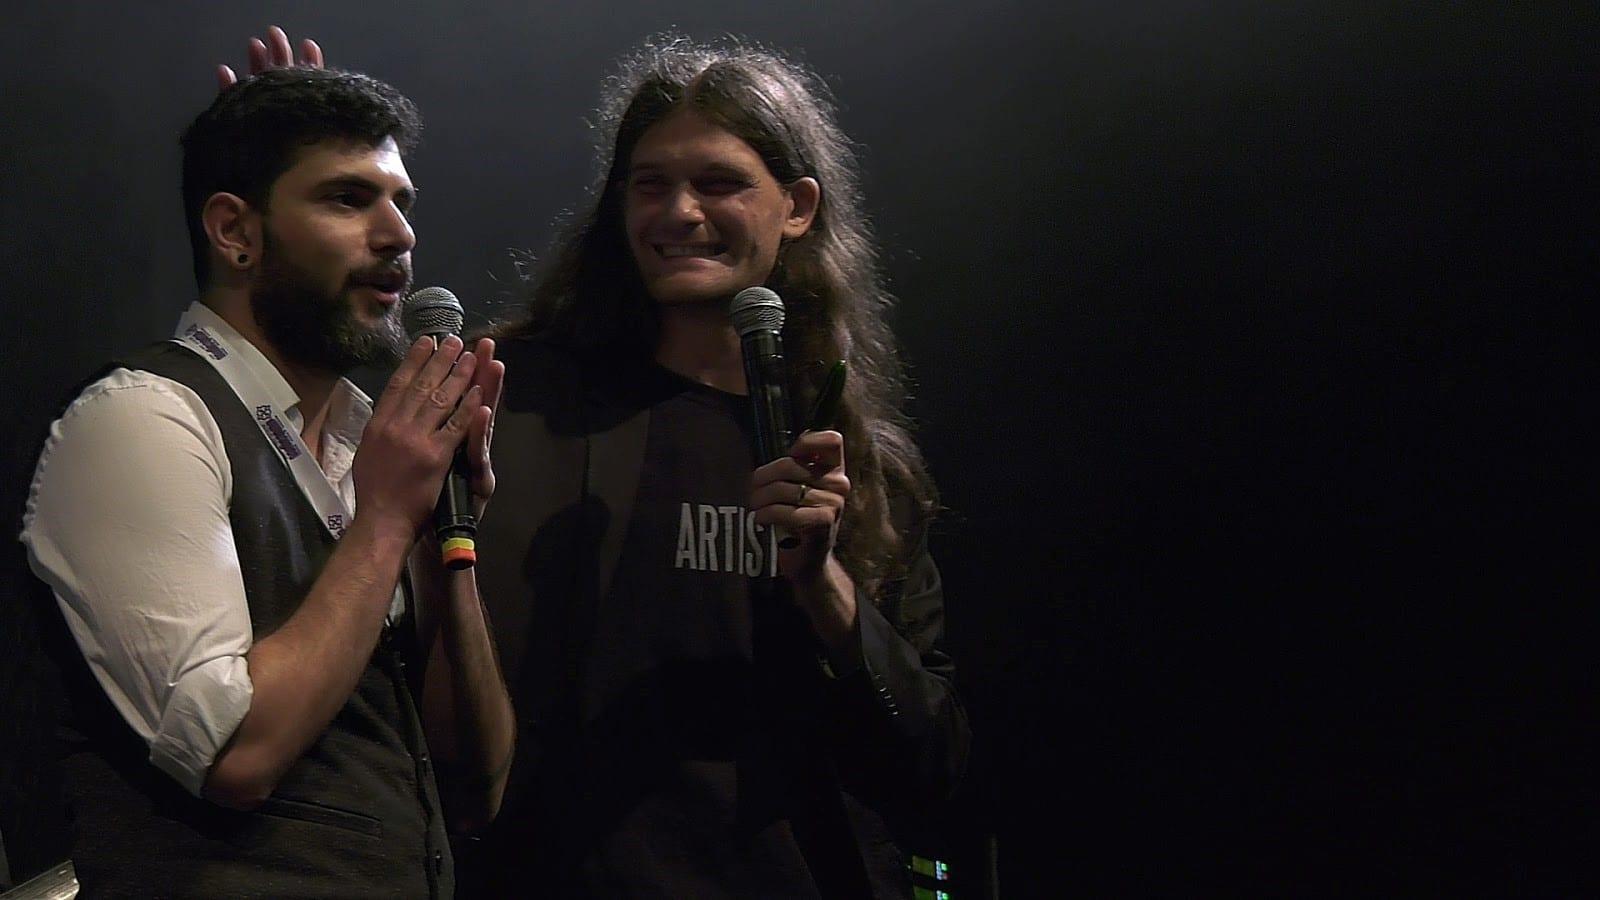 Ben Shmuelof & Arnold Nesis Capricia's Founders